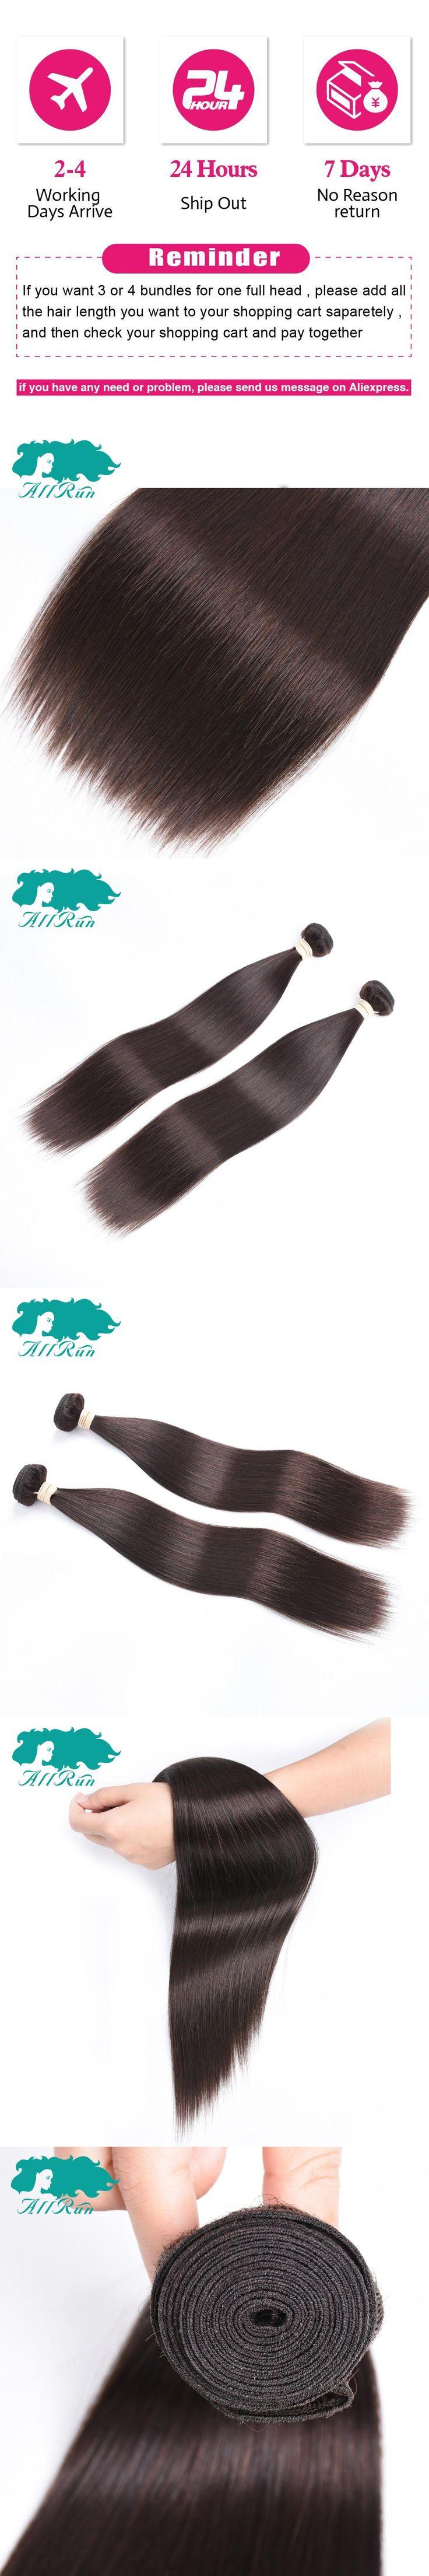 Allrun Pre-colored Straight Hair #2 Dark Brown Malaysian Straight Hair 2 Bundles Pack Malaysian Hair Bundles Free Shipping